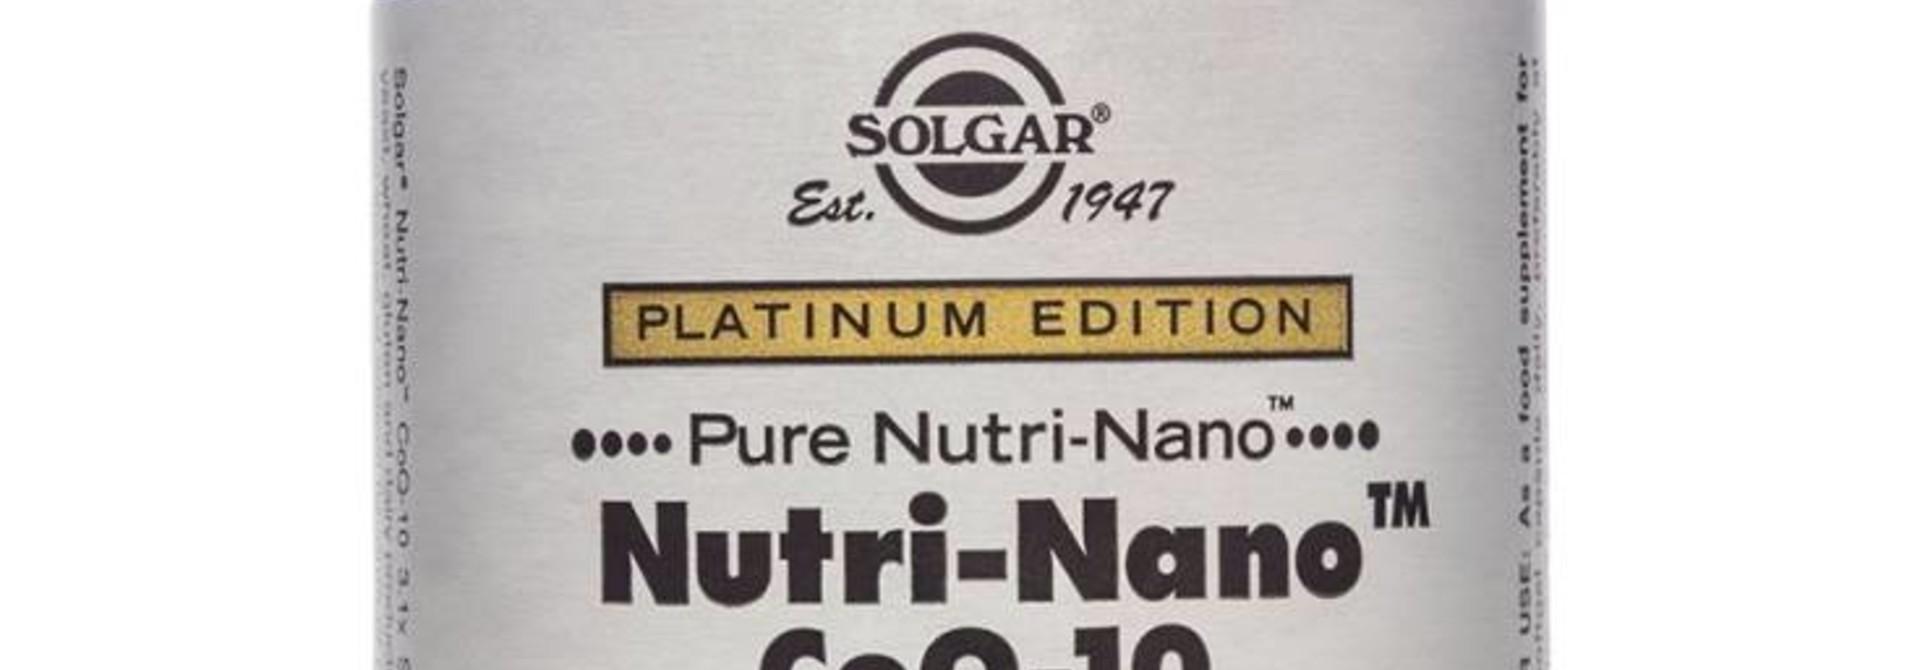 Nutri-Nano™ CoQ-10 3.1x 50 softgels